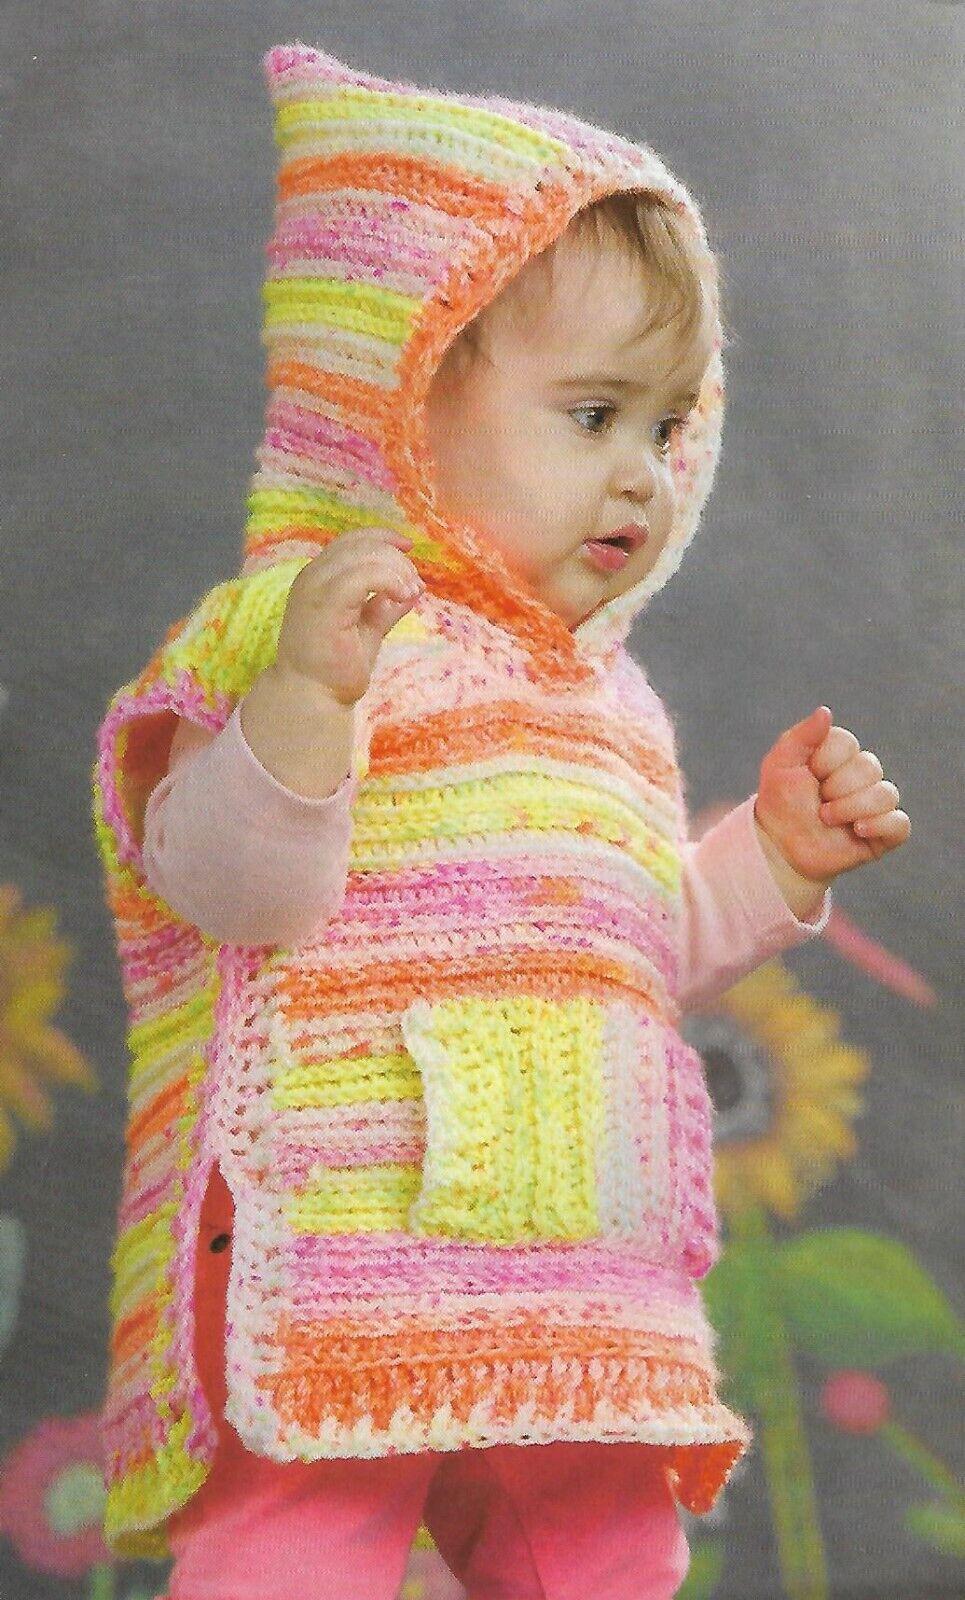 Pop-on Poncho Cavendish Crochet Pattern//Instructions Leaflet NEW